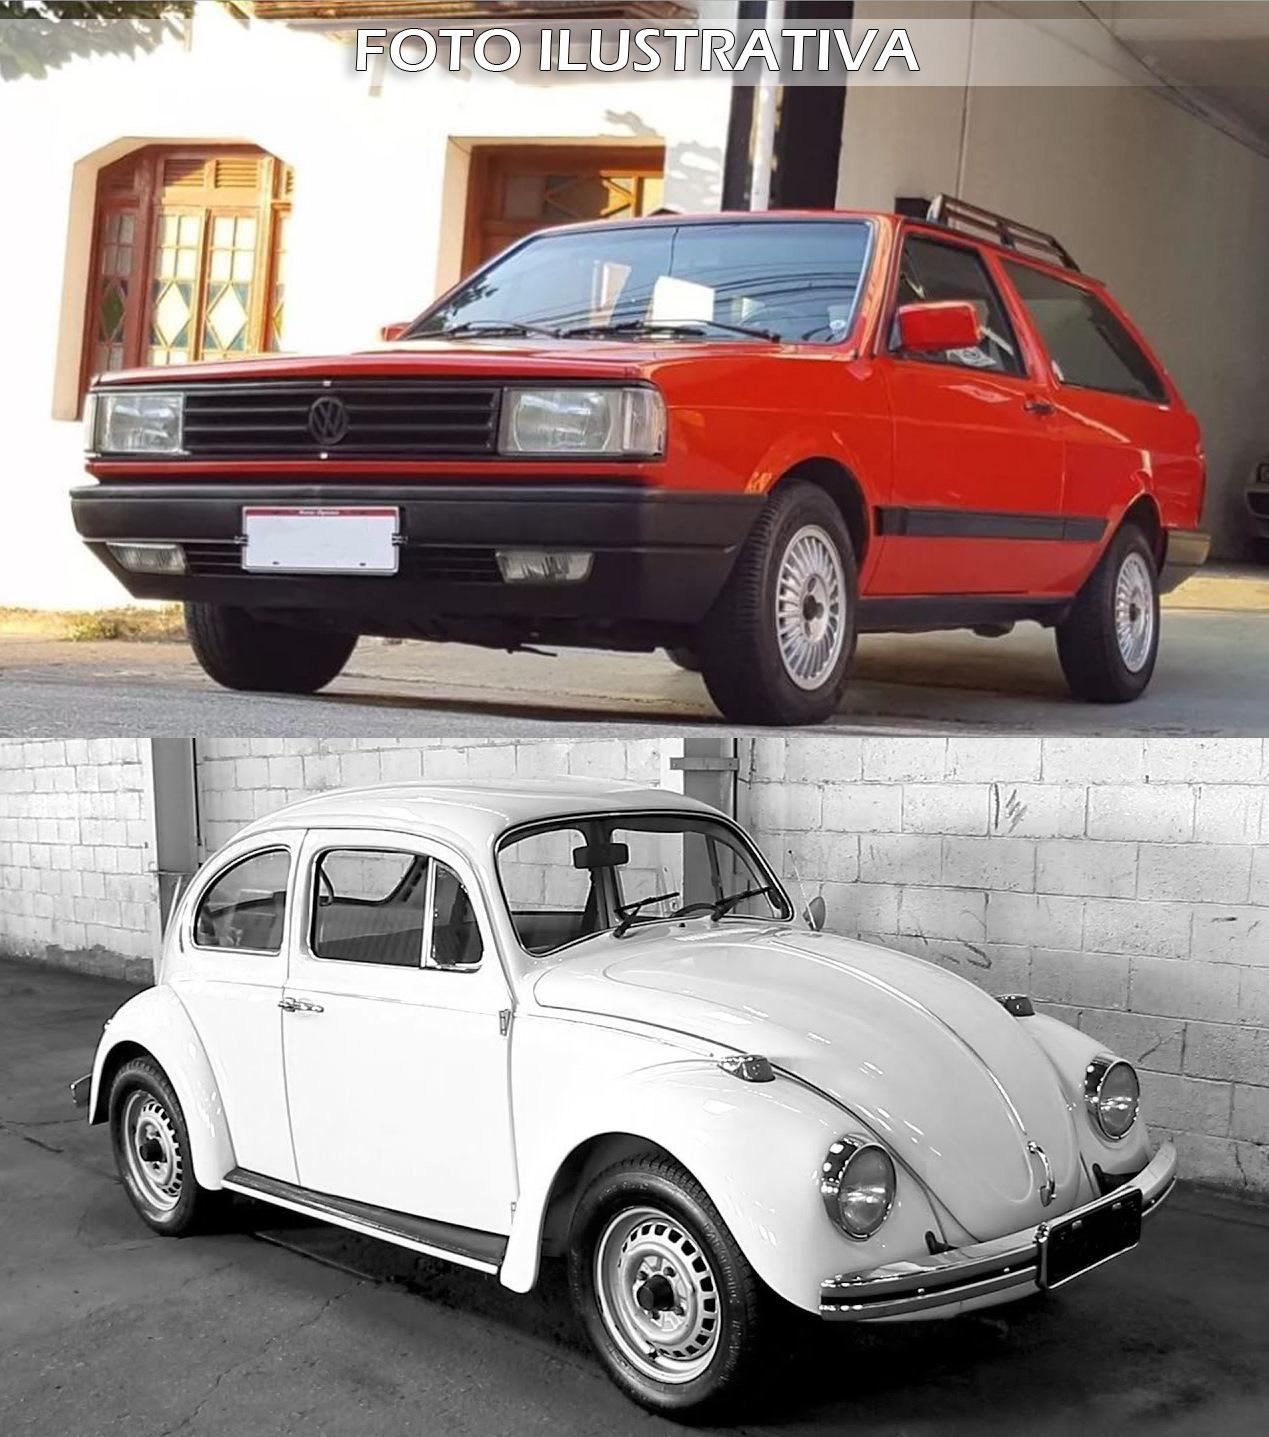 VW Parati GL ano 1990 e VW Fusca 1300 ano 1977